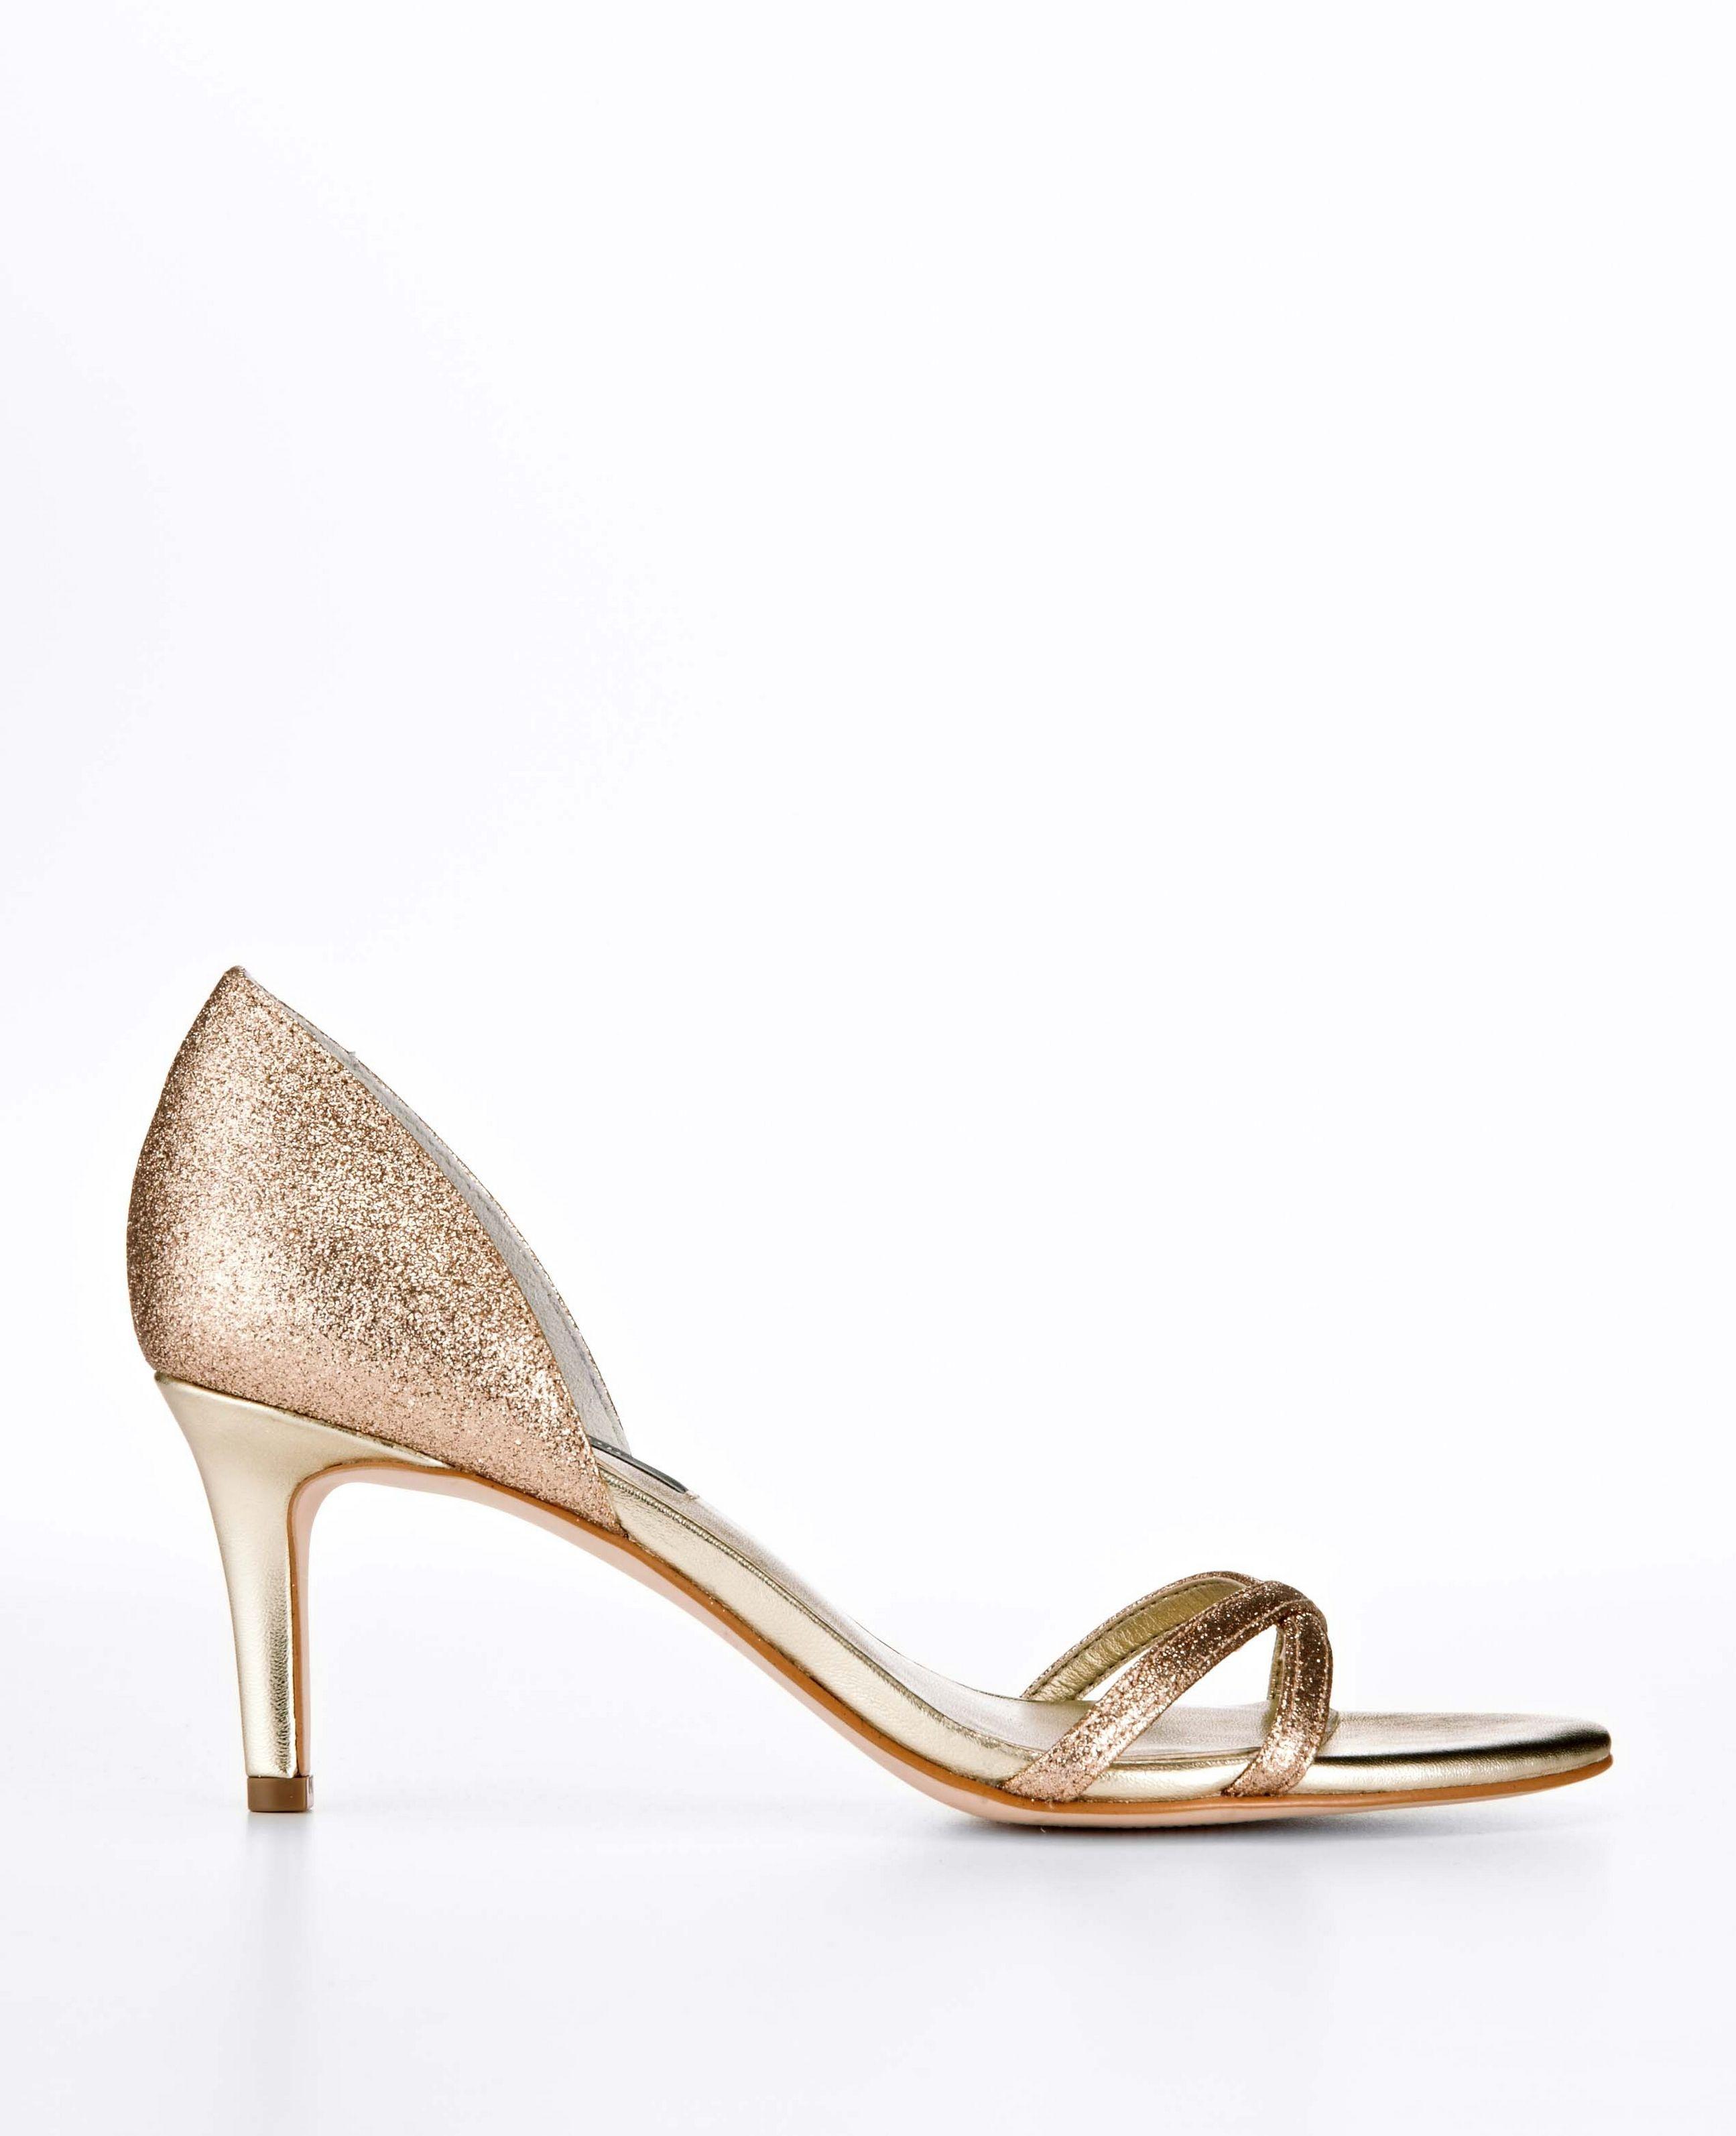 f4c3cd2e388f 100 Beautiful Golden Shoes Heel Ideas https   femaline.com 2017